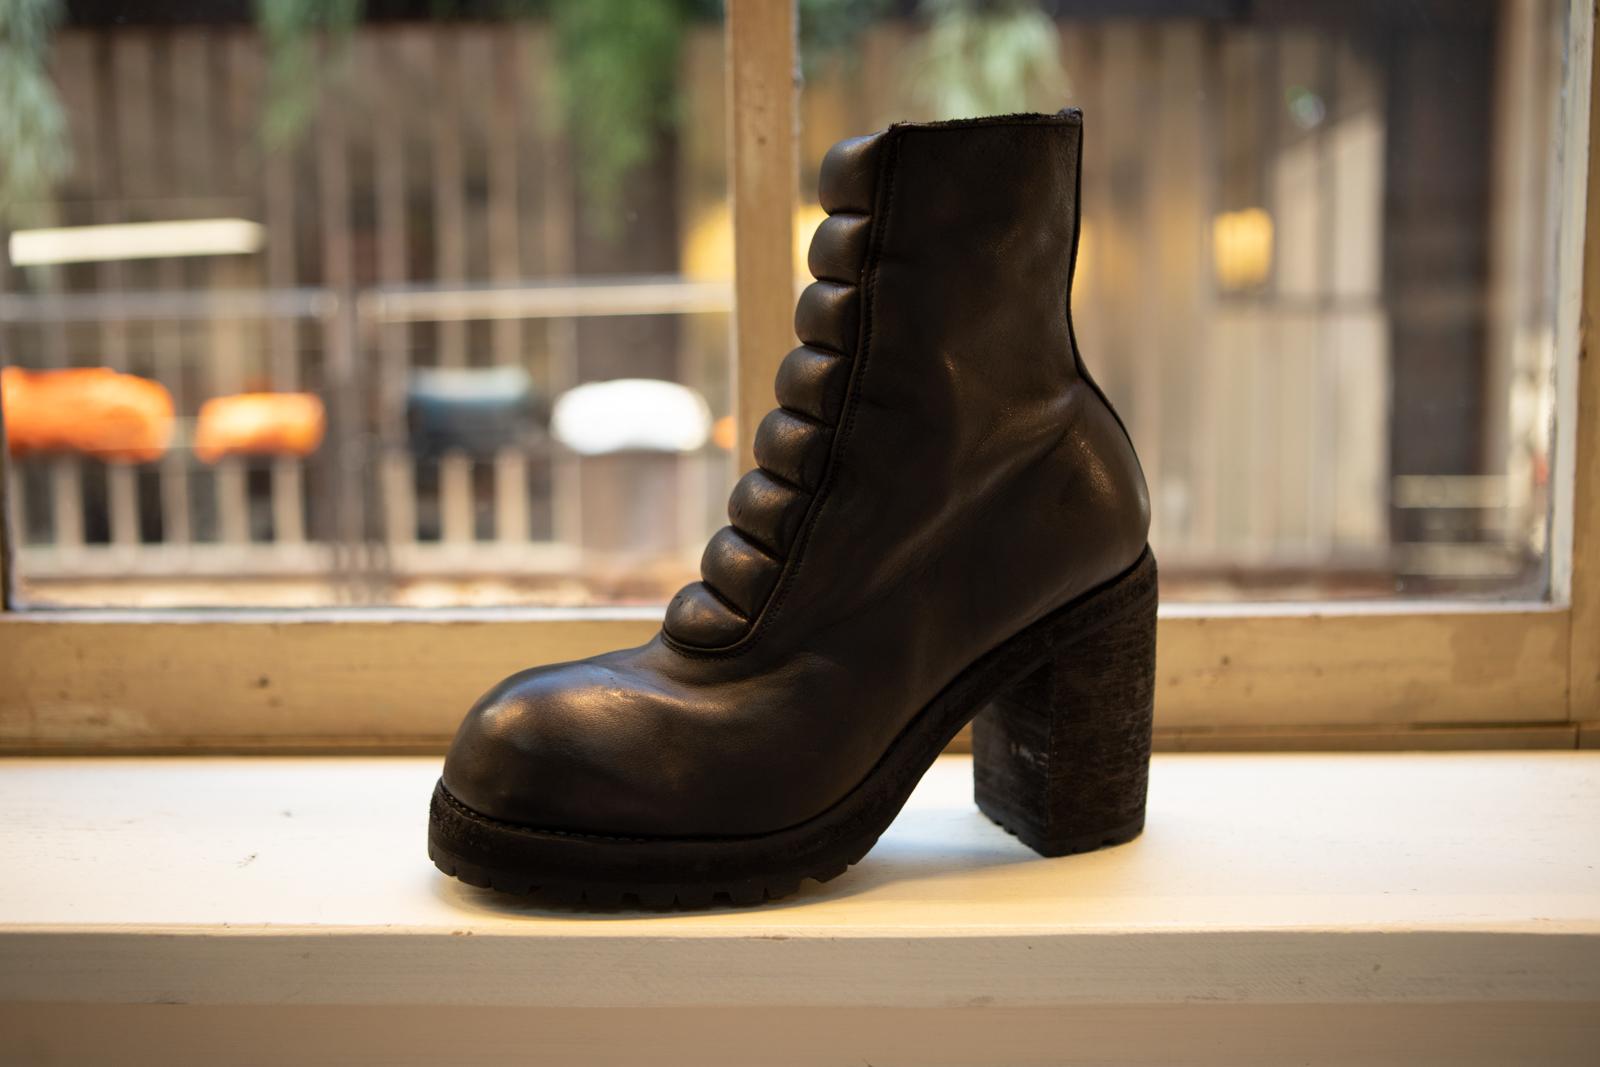 Guidi High Heel Boot in Black Leather FW20